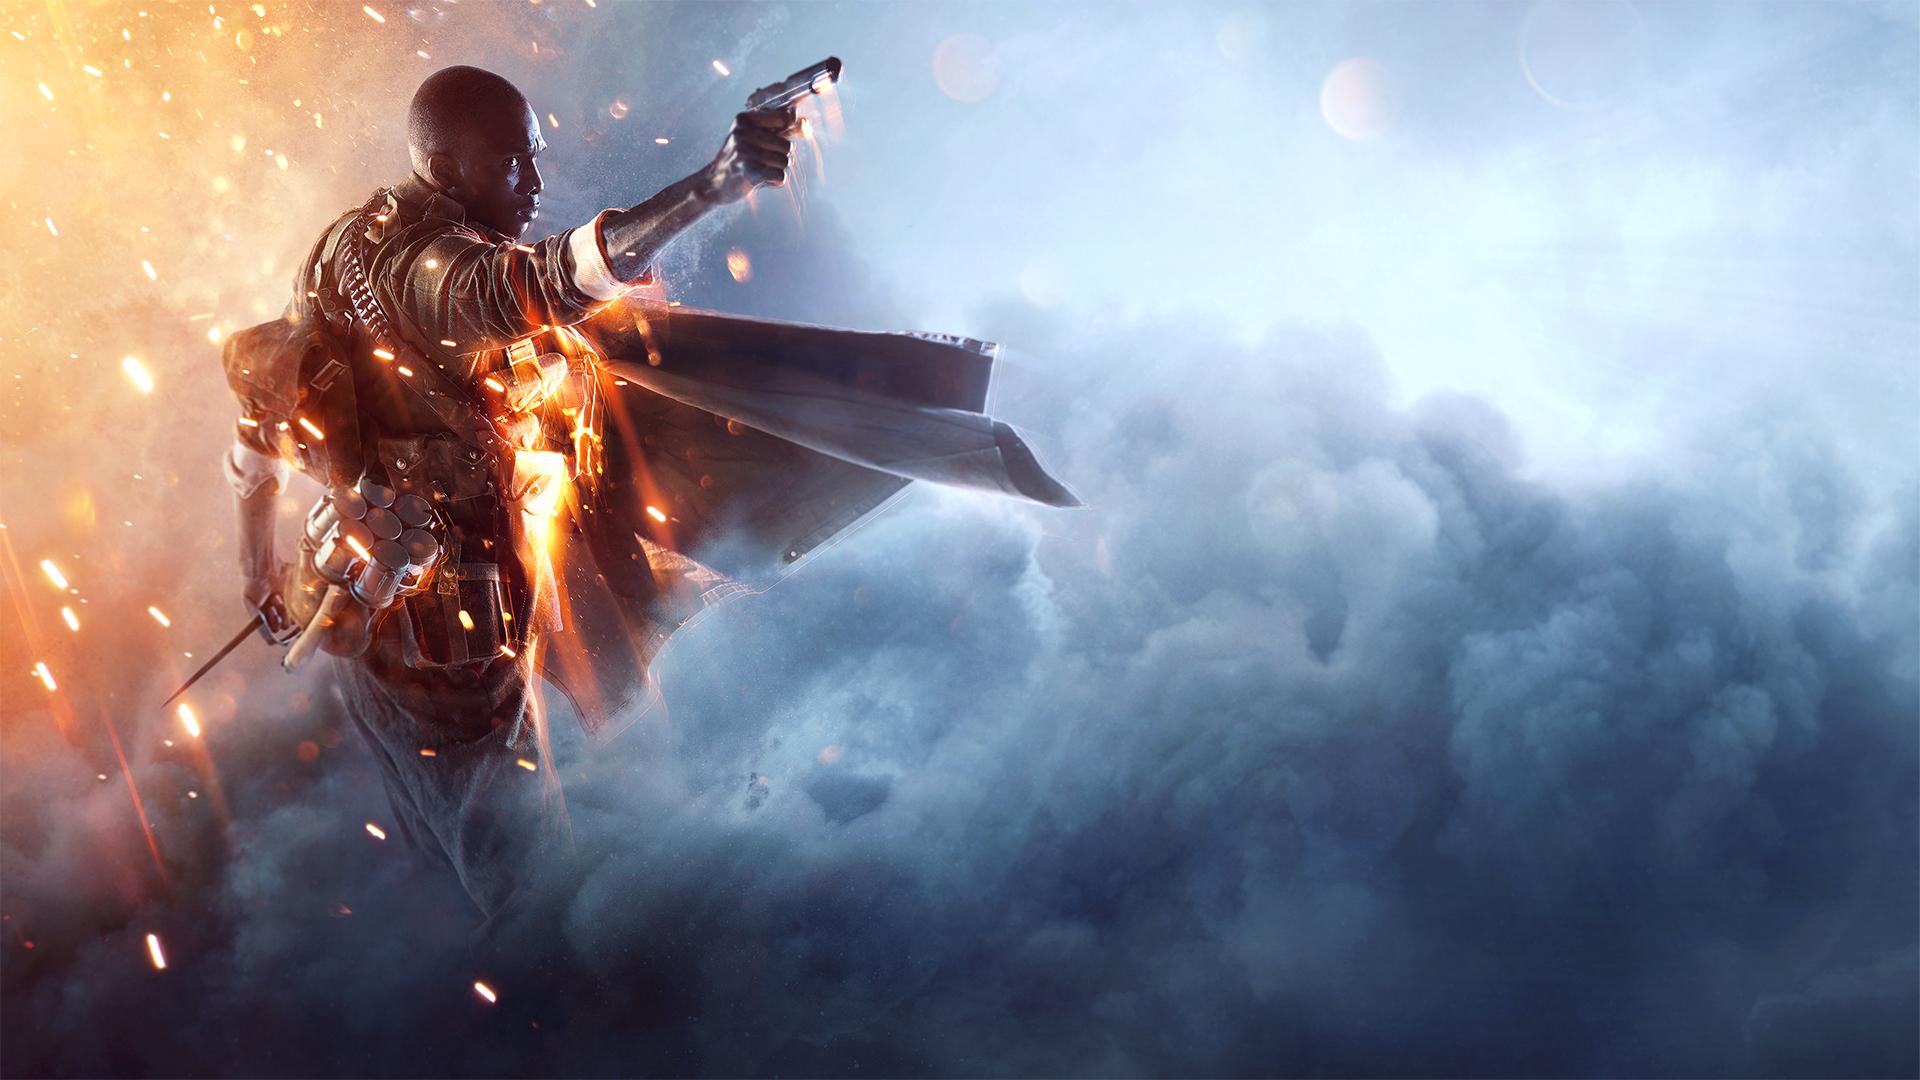 Battlefield 4 Full Hd Fond D écran And Arrière Plan: Battlefield 1 Fond D'écran HD